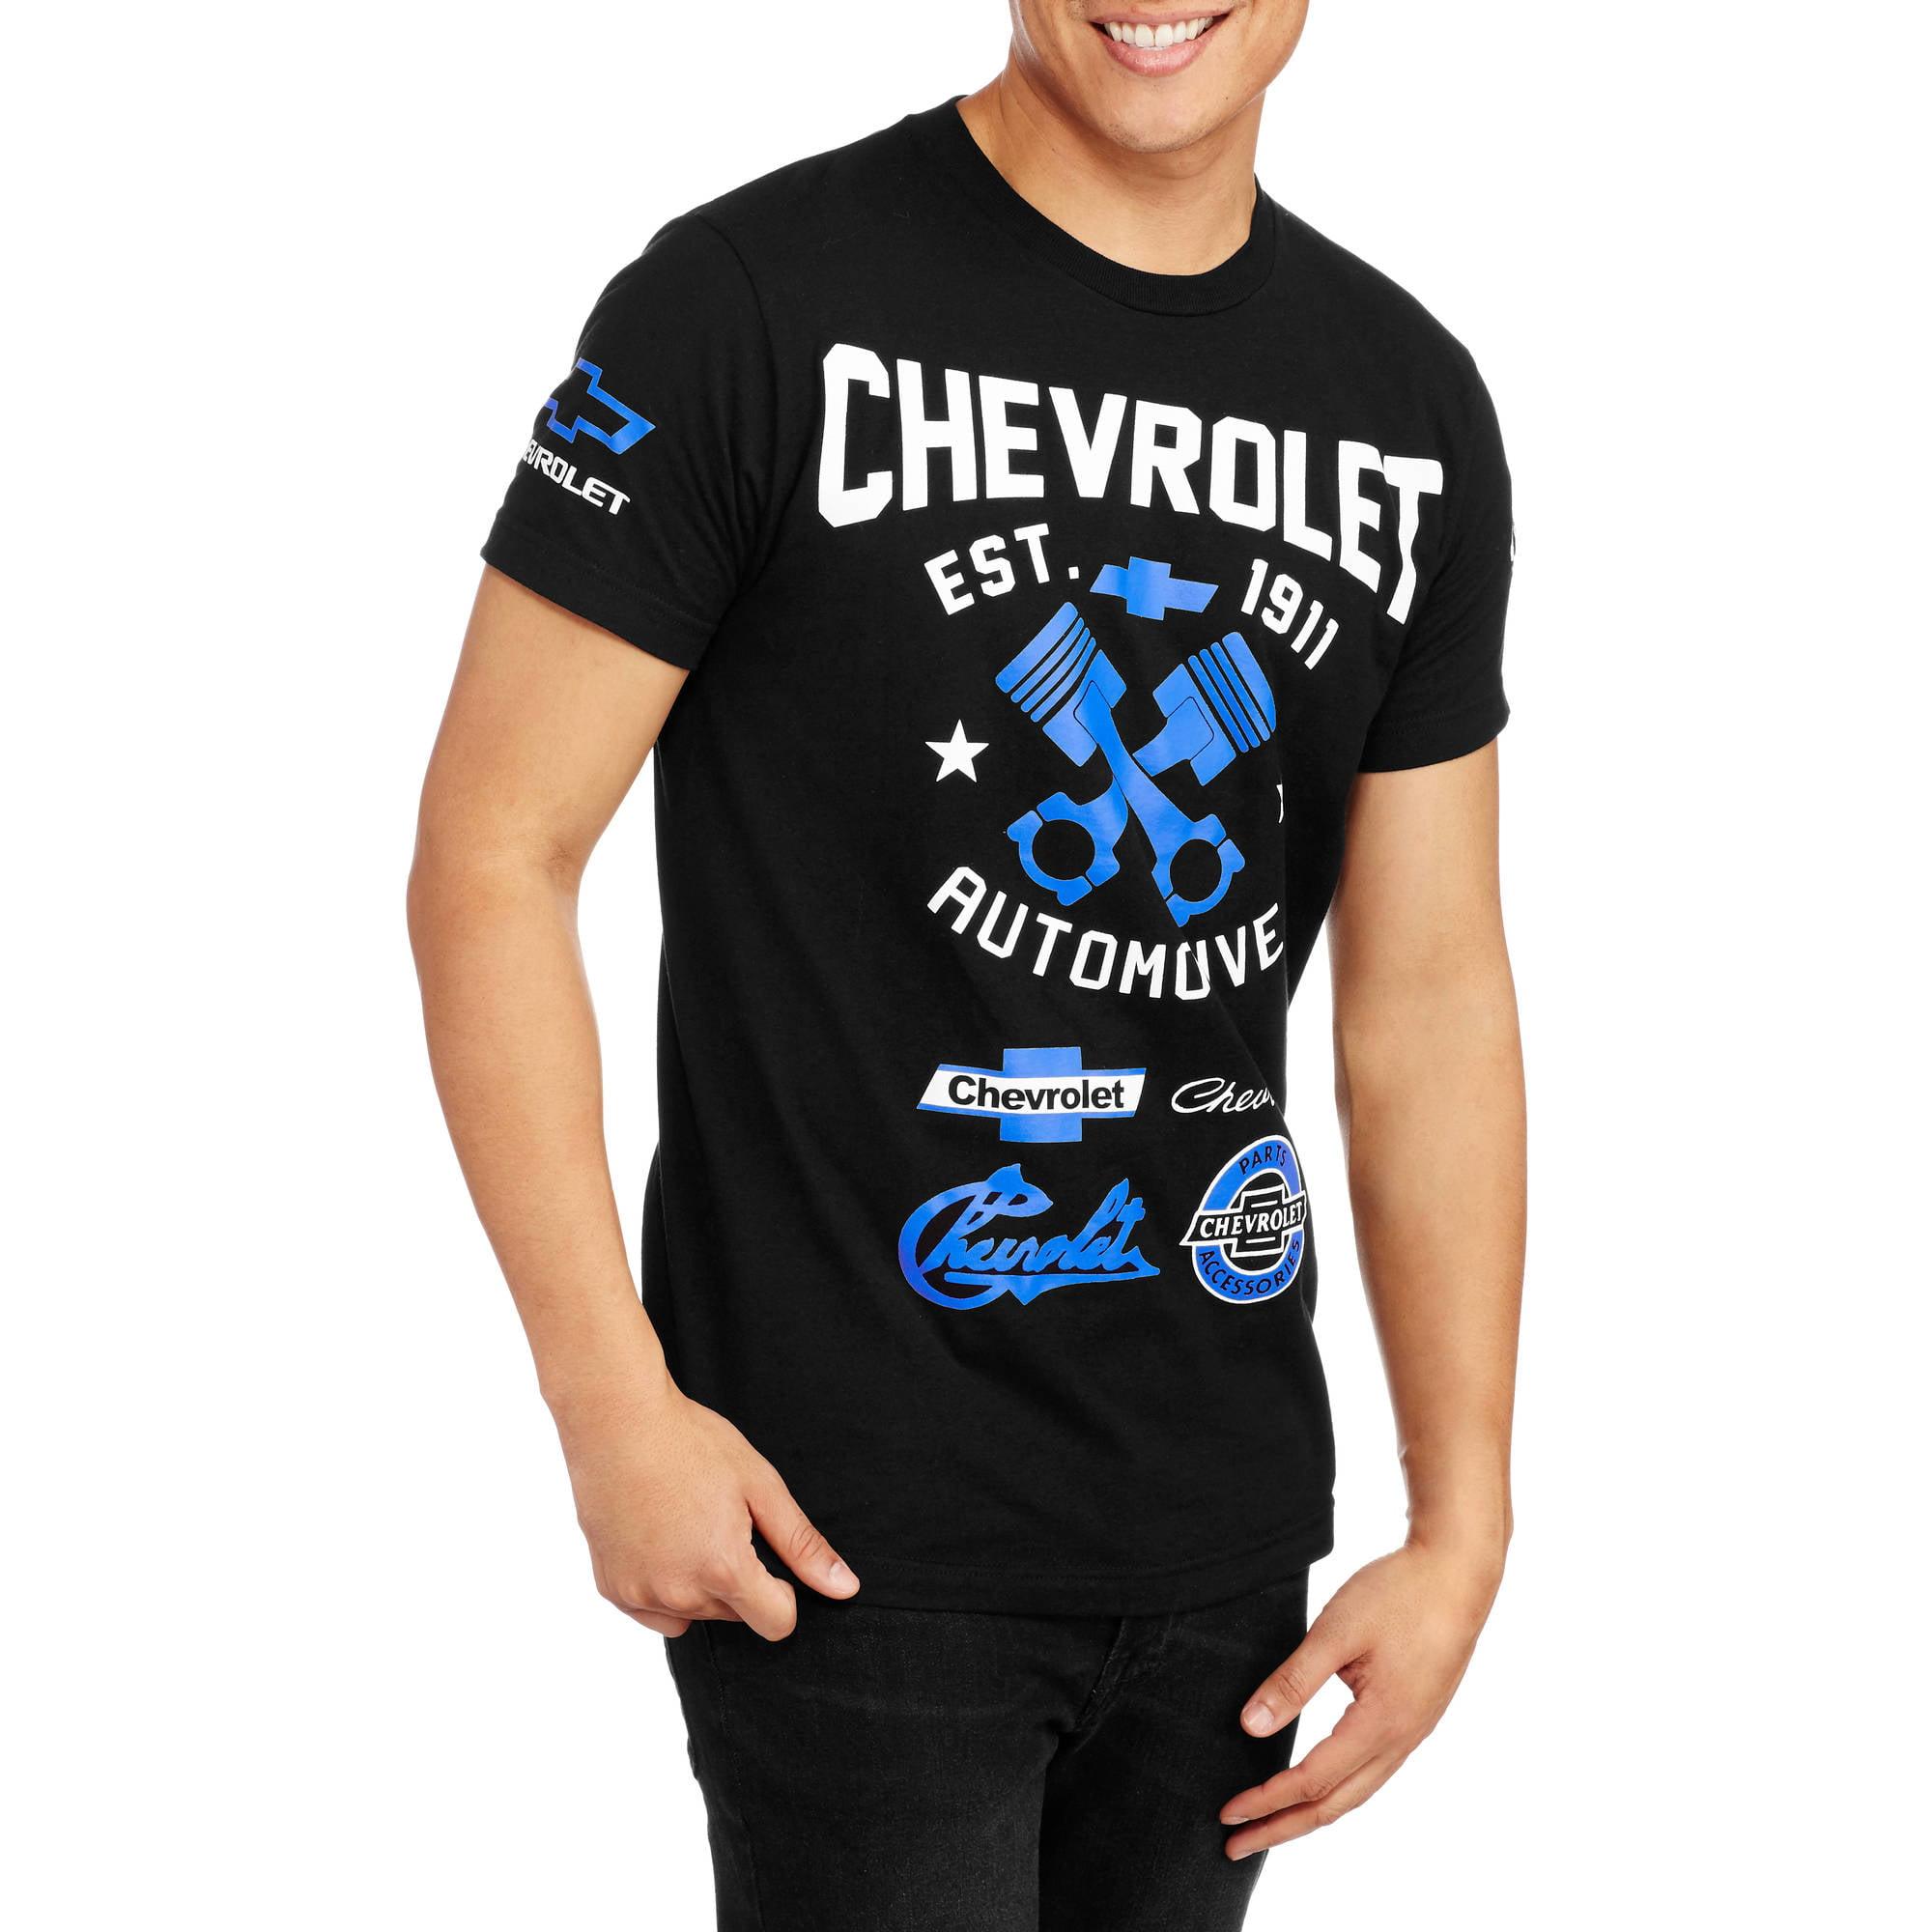 Big Men's Chevrolet Automotive Short Sleeve Graphic Tee, 2XL